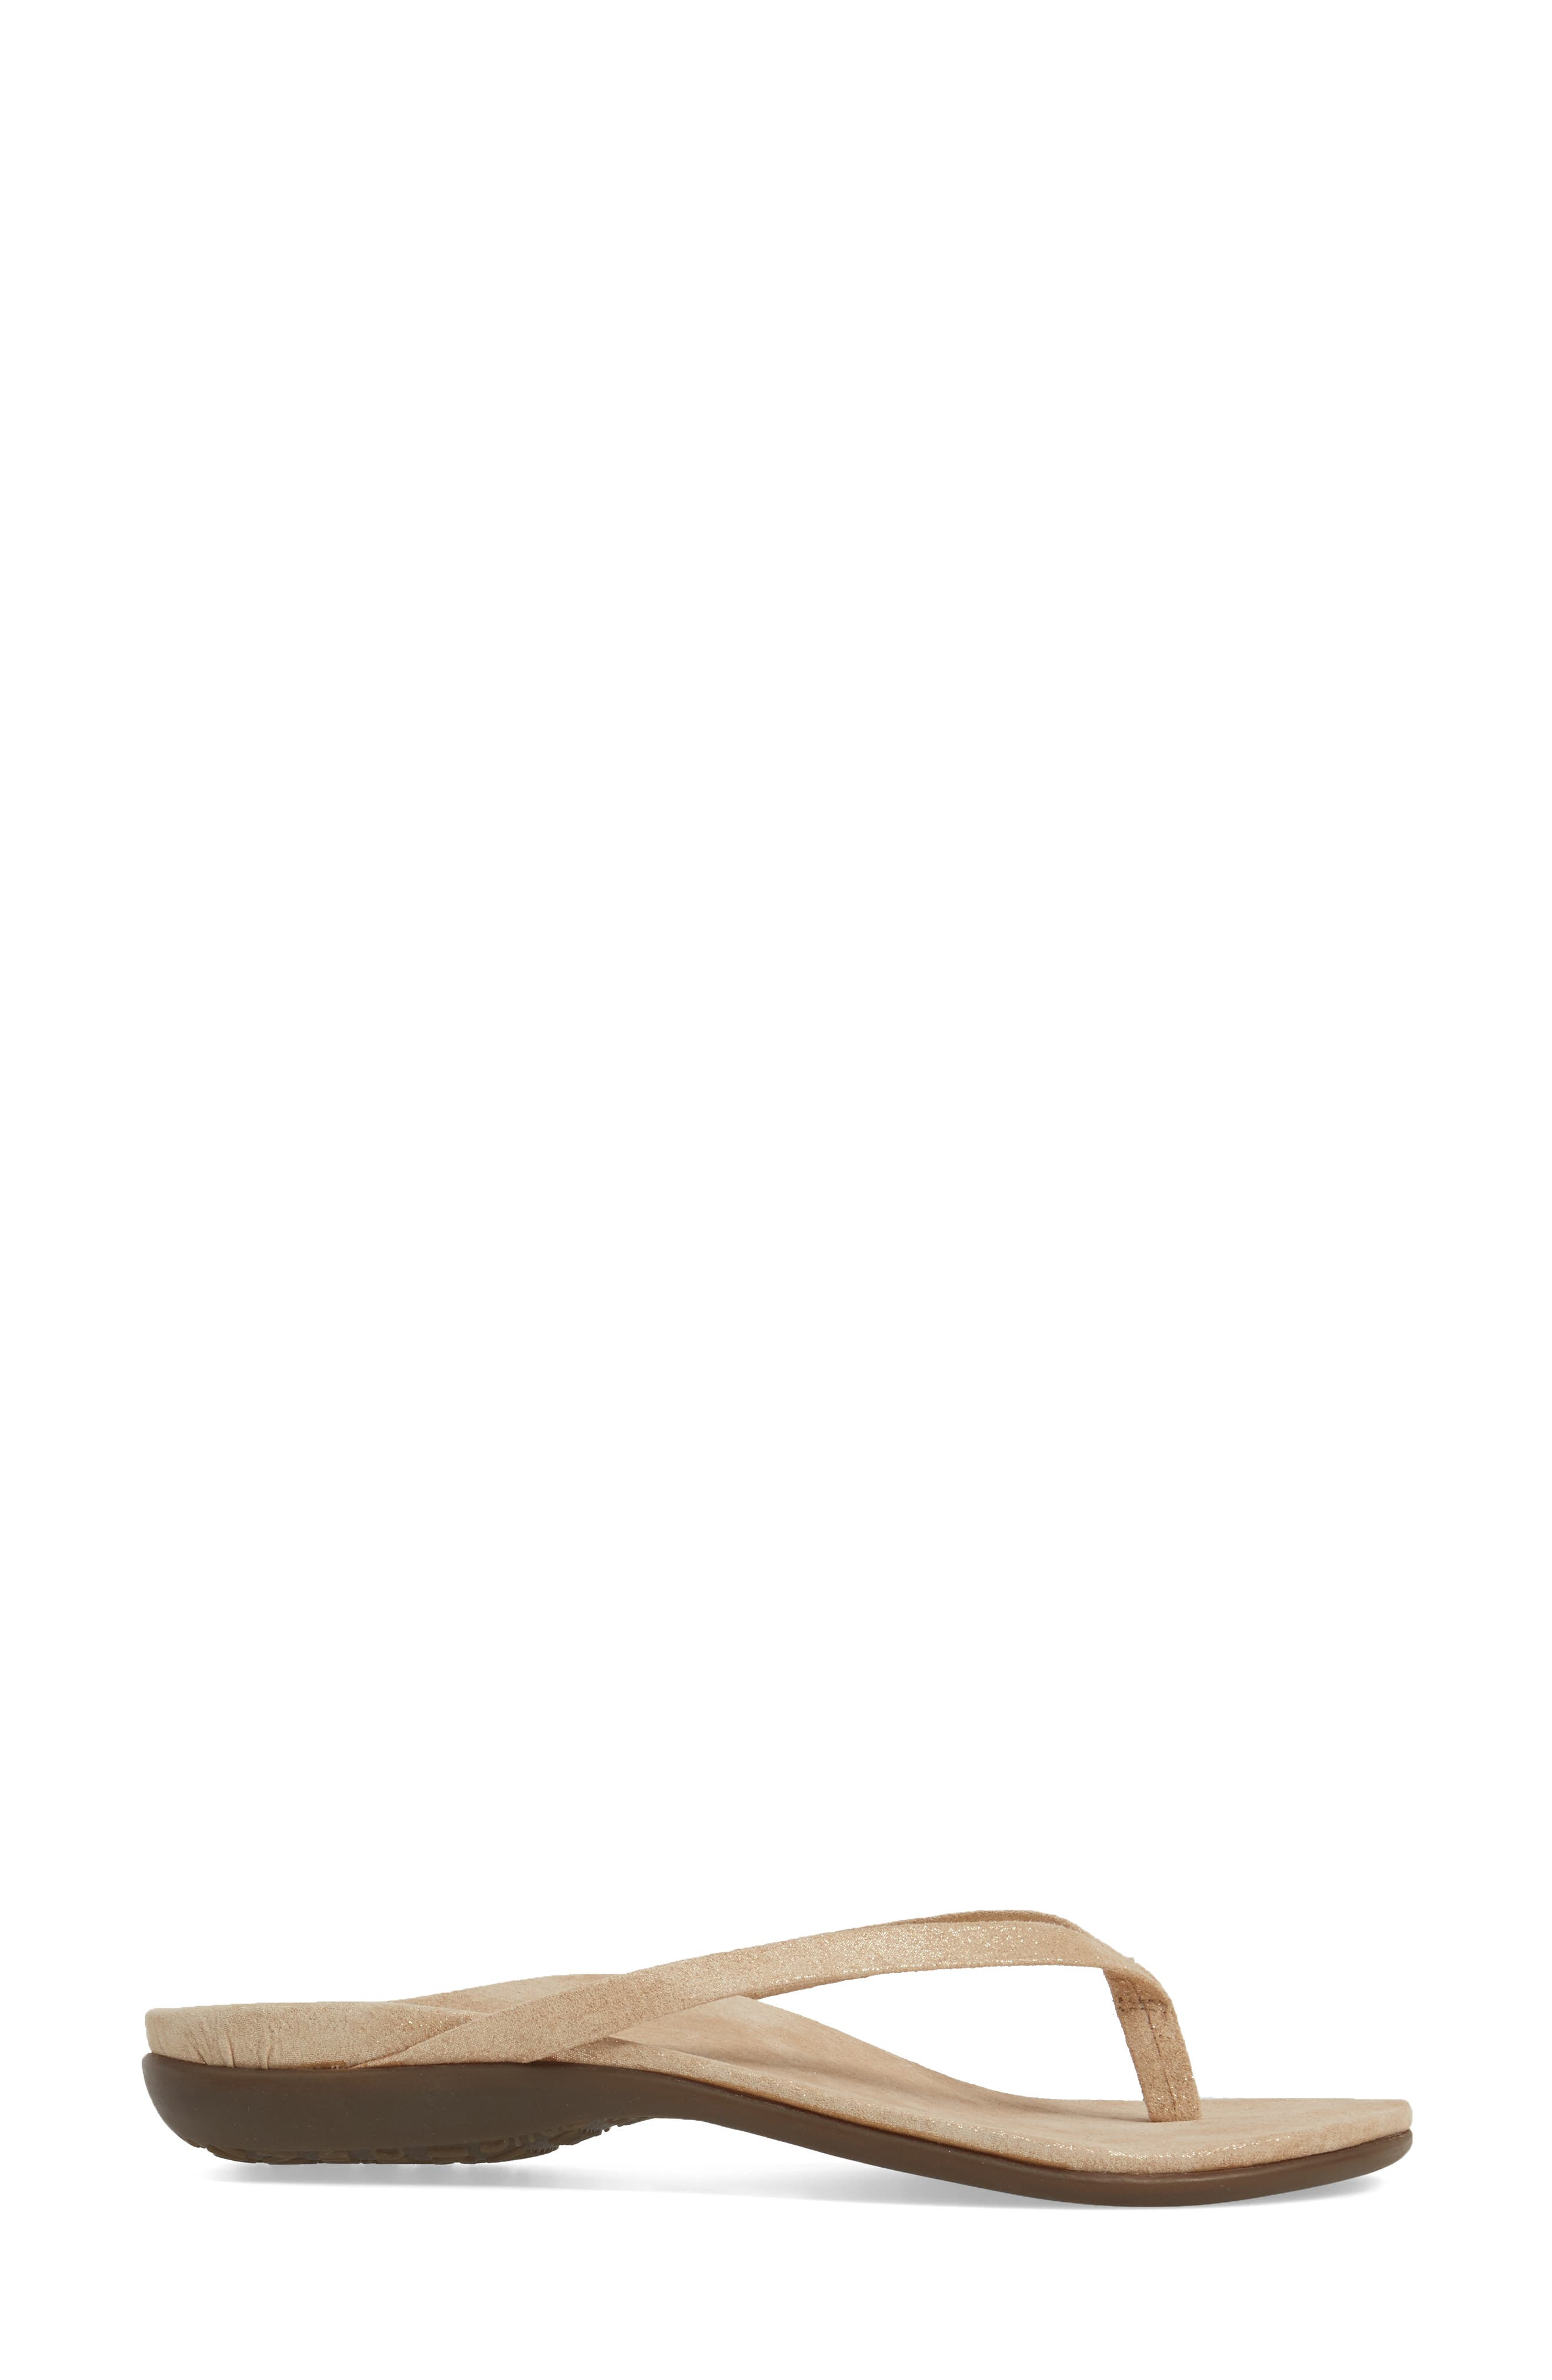 'Corfu' Sandal,                             Alternate thumbnail 3, color,                             290